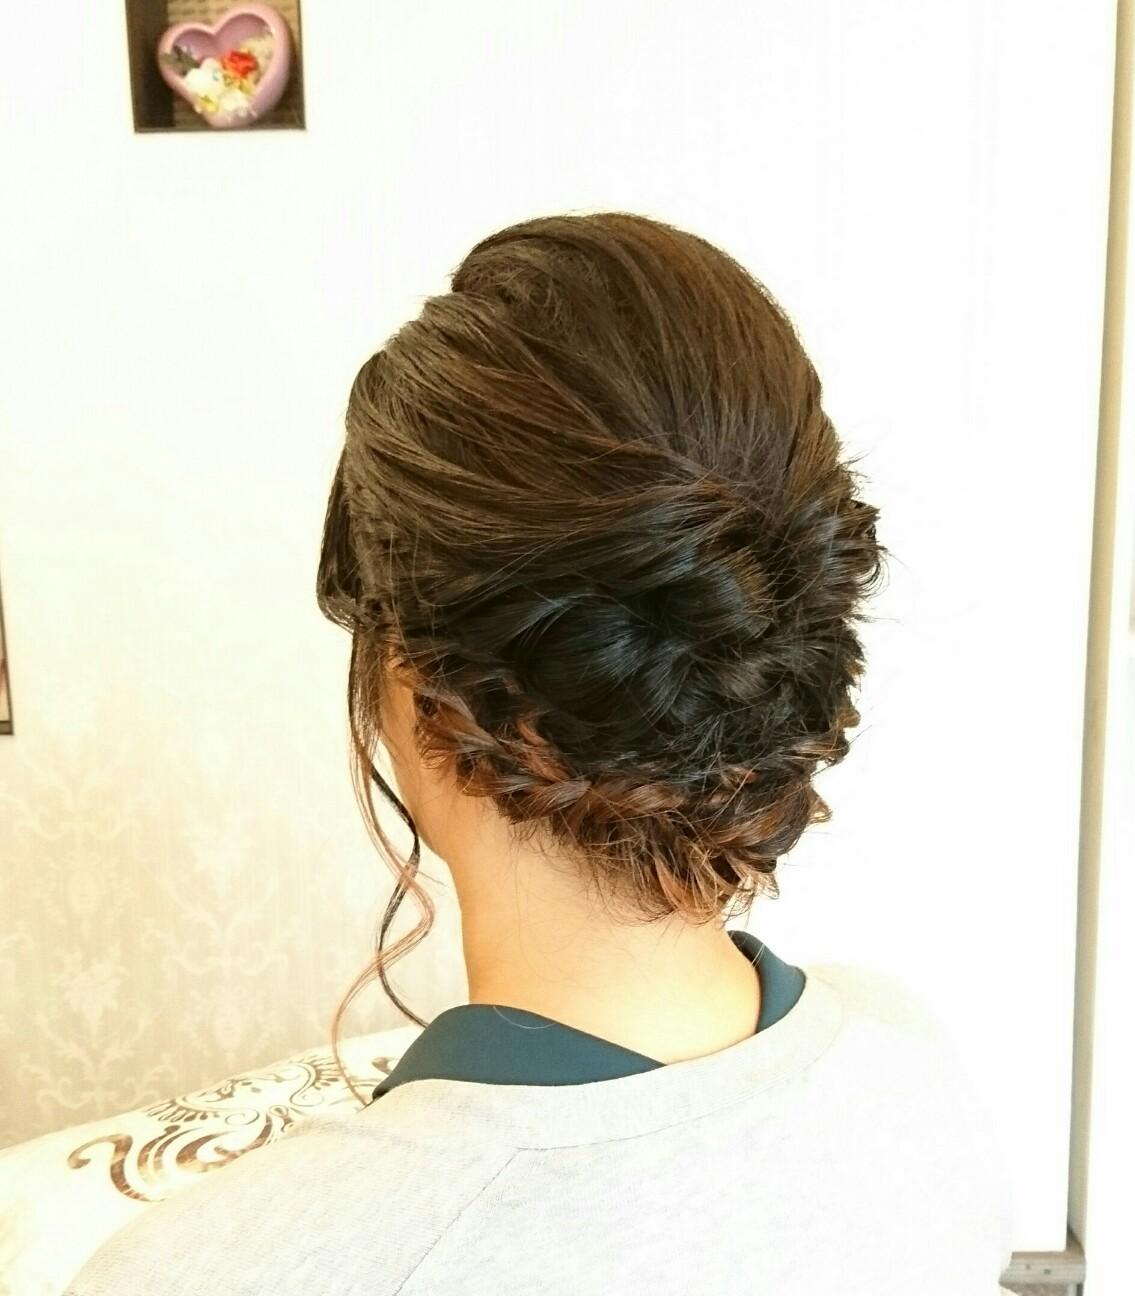 f:id:aquayukino:20180916010858j:image